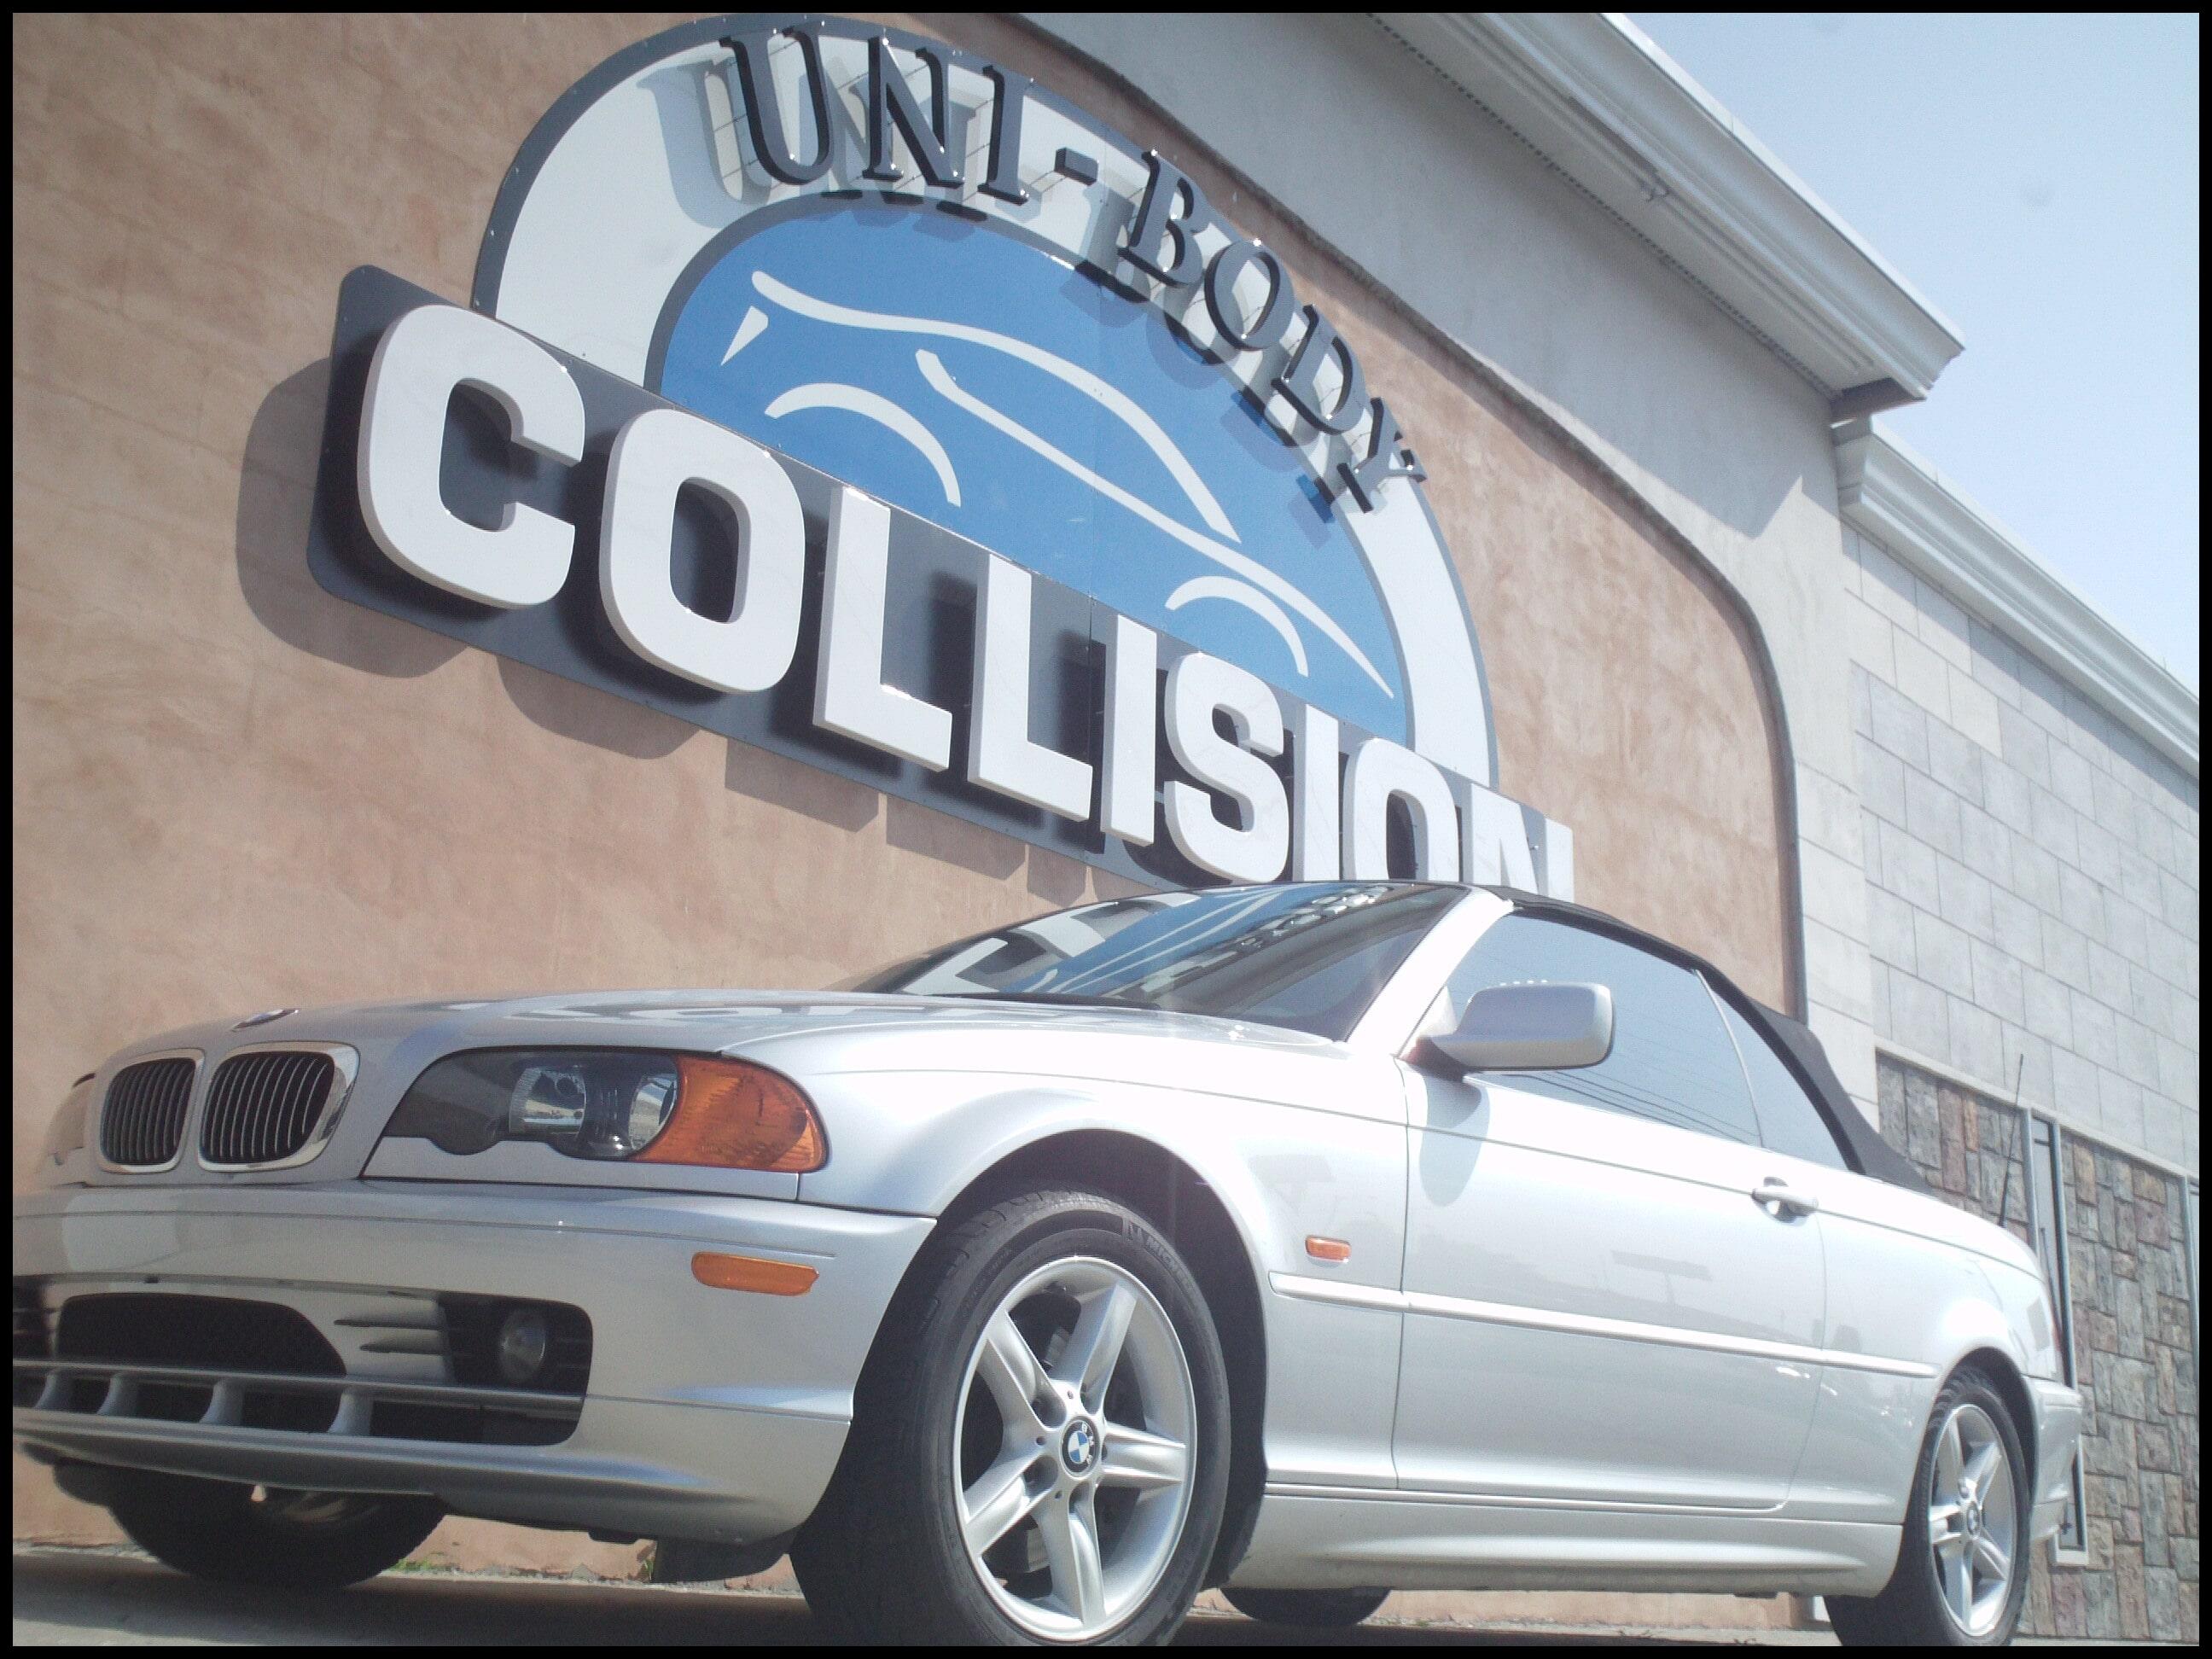 Silver Car — Auto Body Repair in Roseville MI